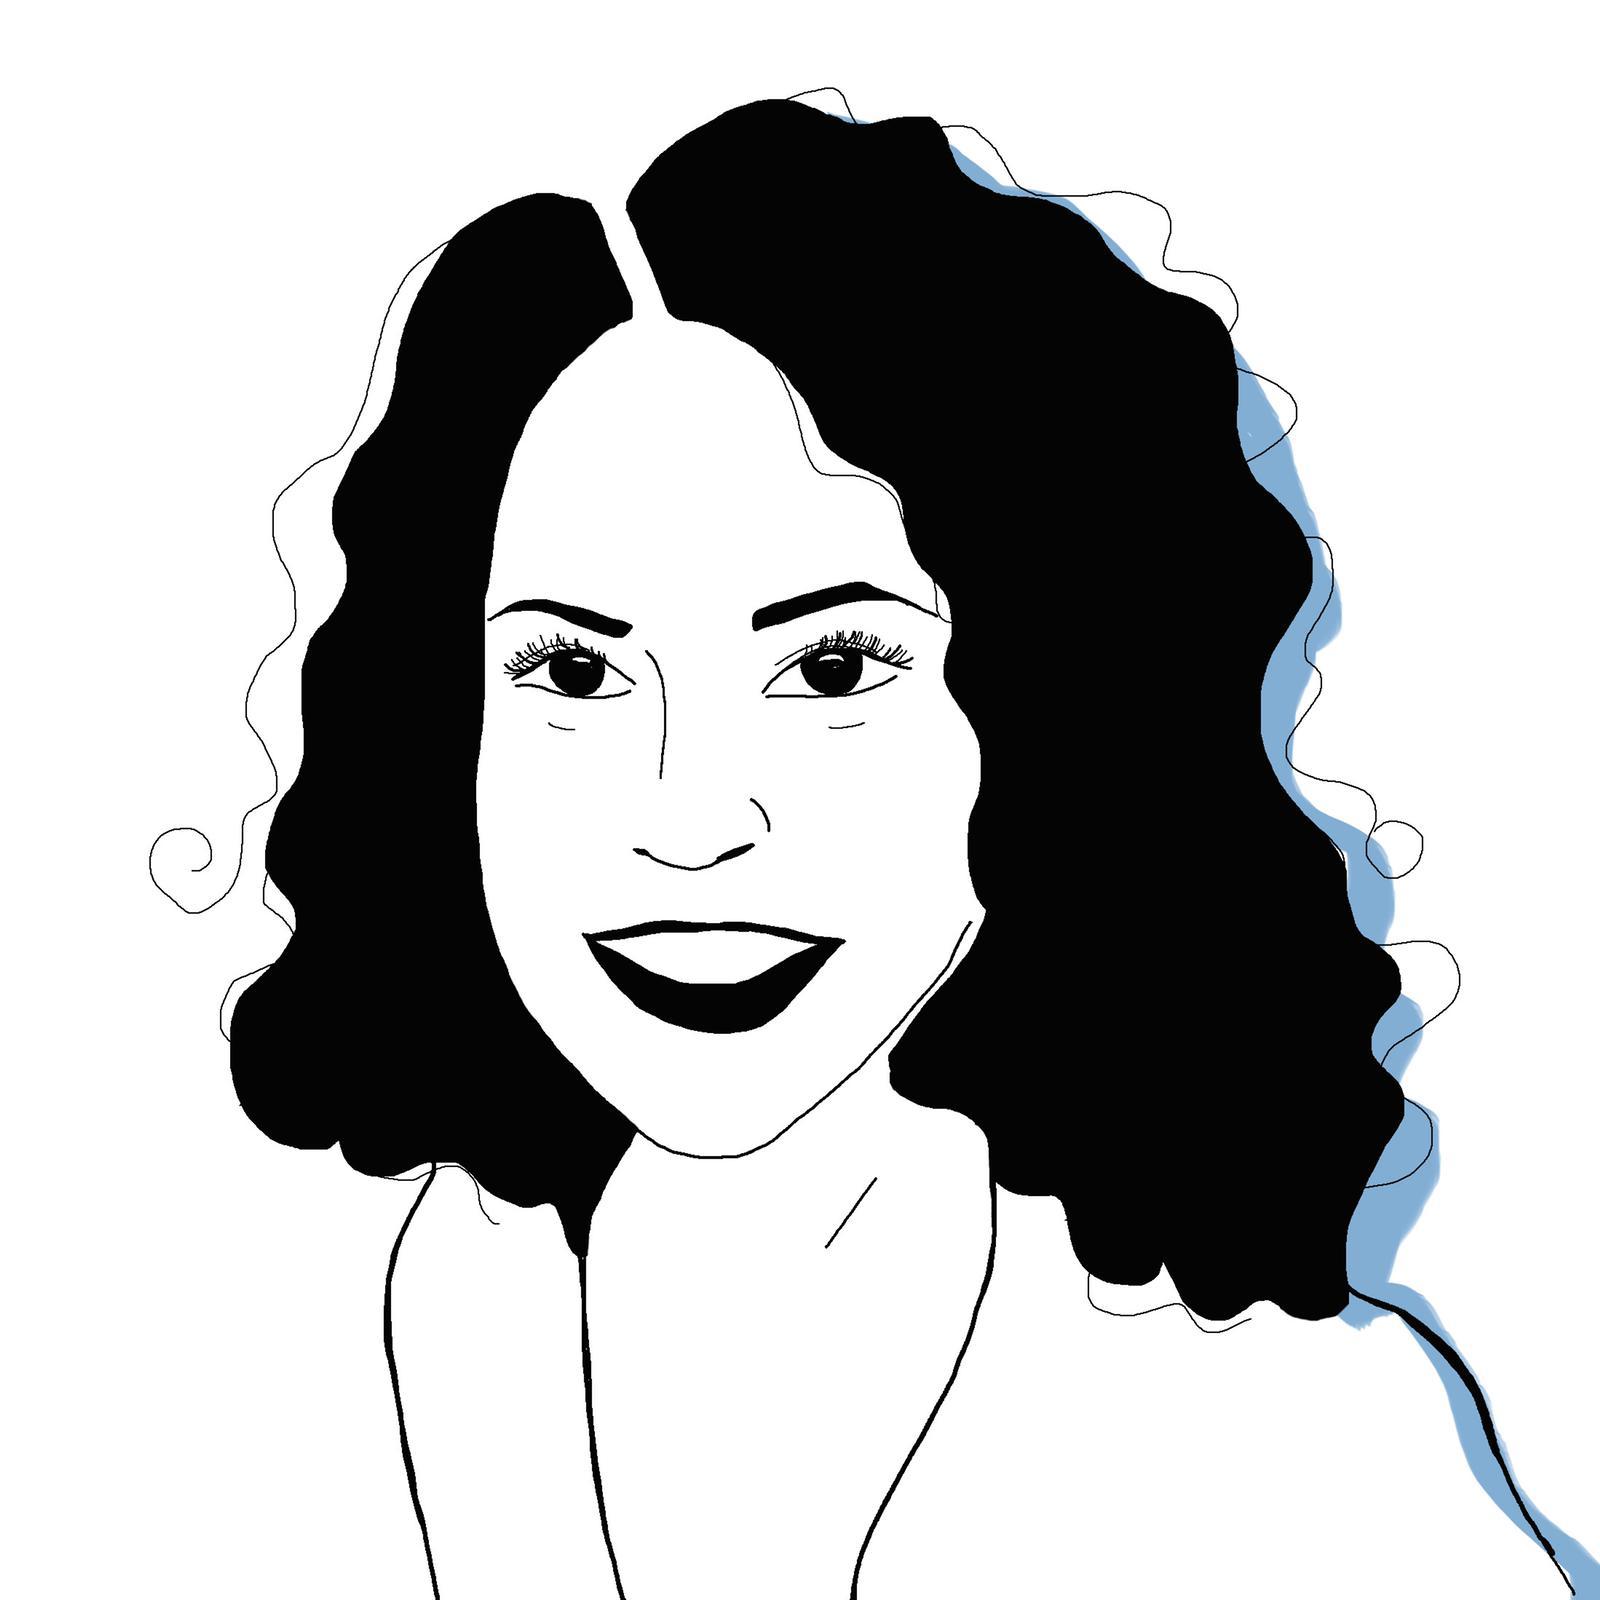 A black and white illustration of Katie Kheriji-Watts